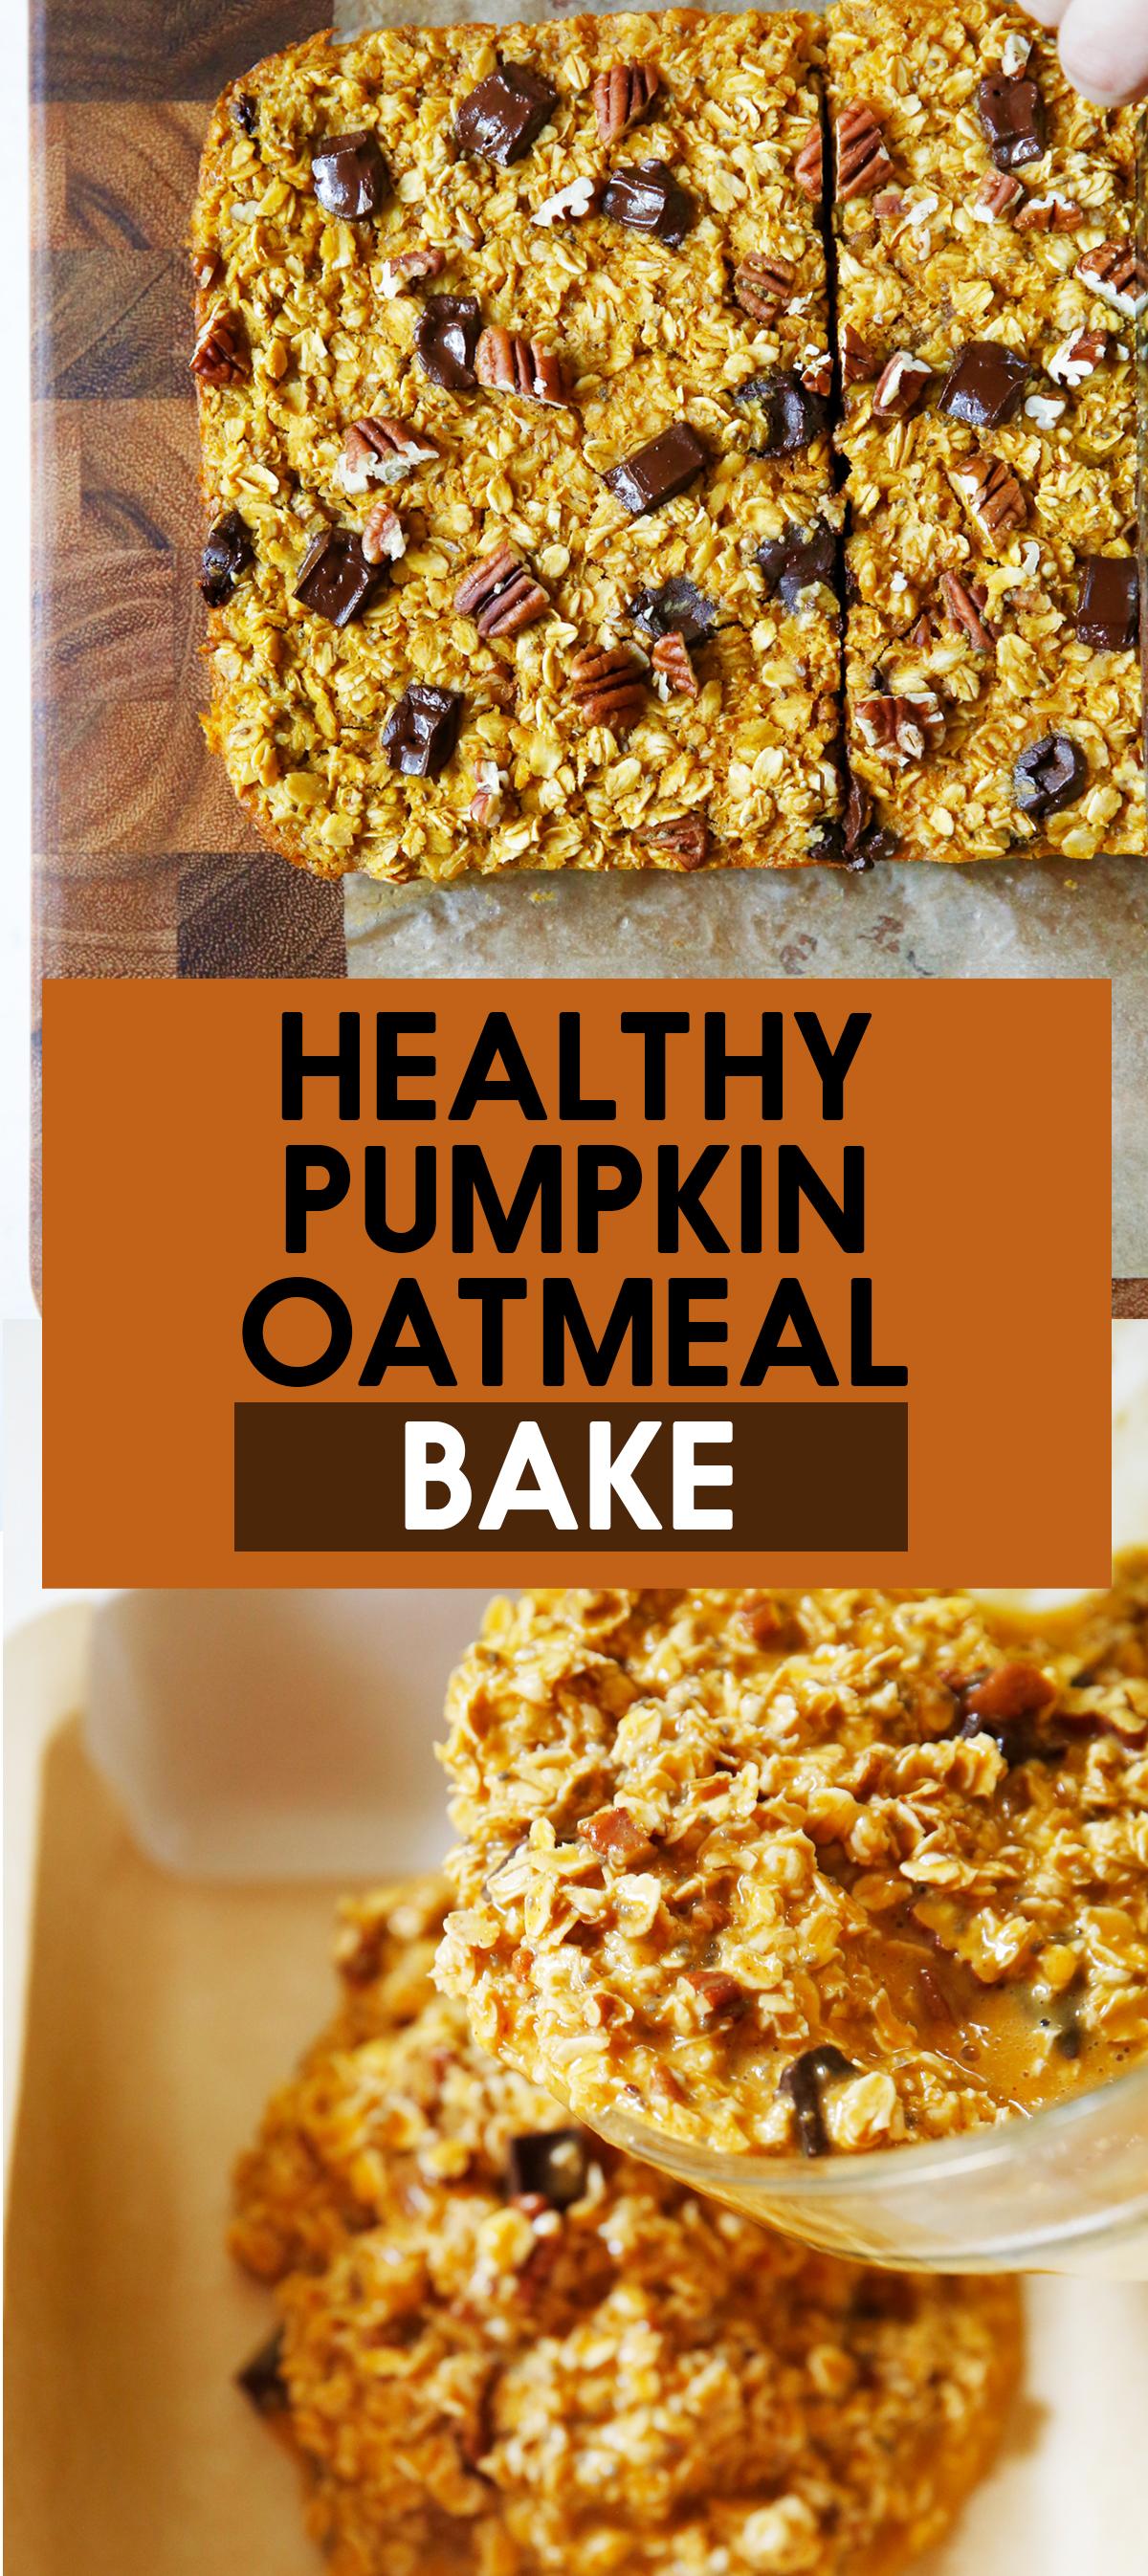 Lexi S Clean Kitchen Pumpkin Oatmeal Bake